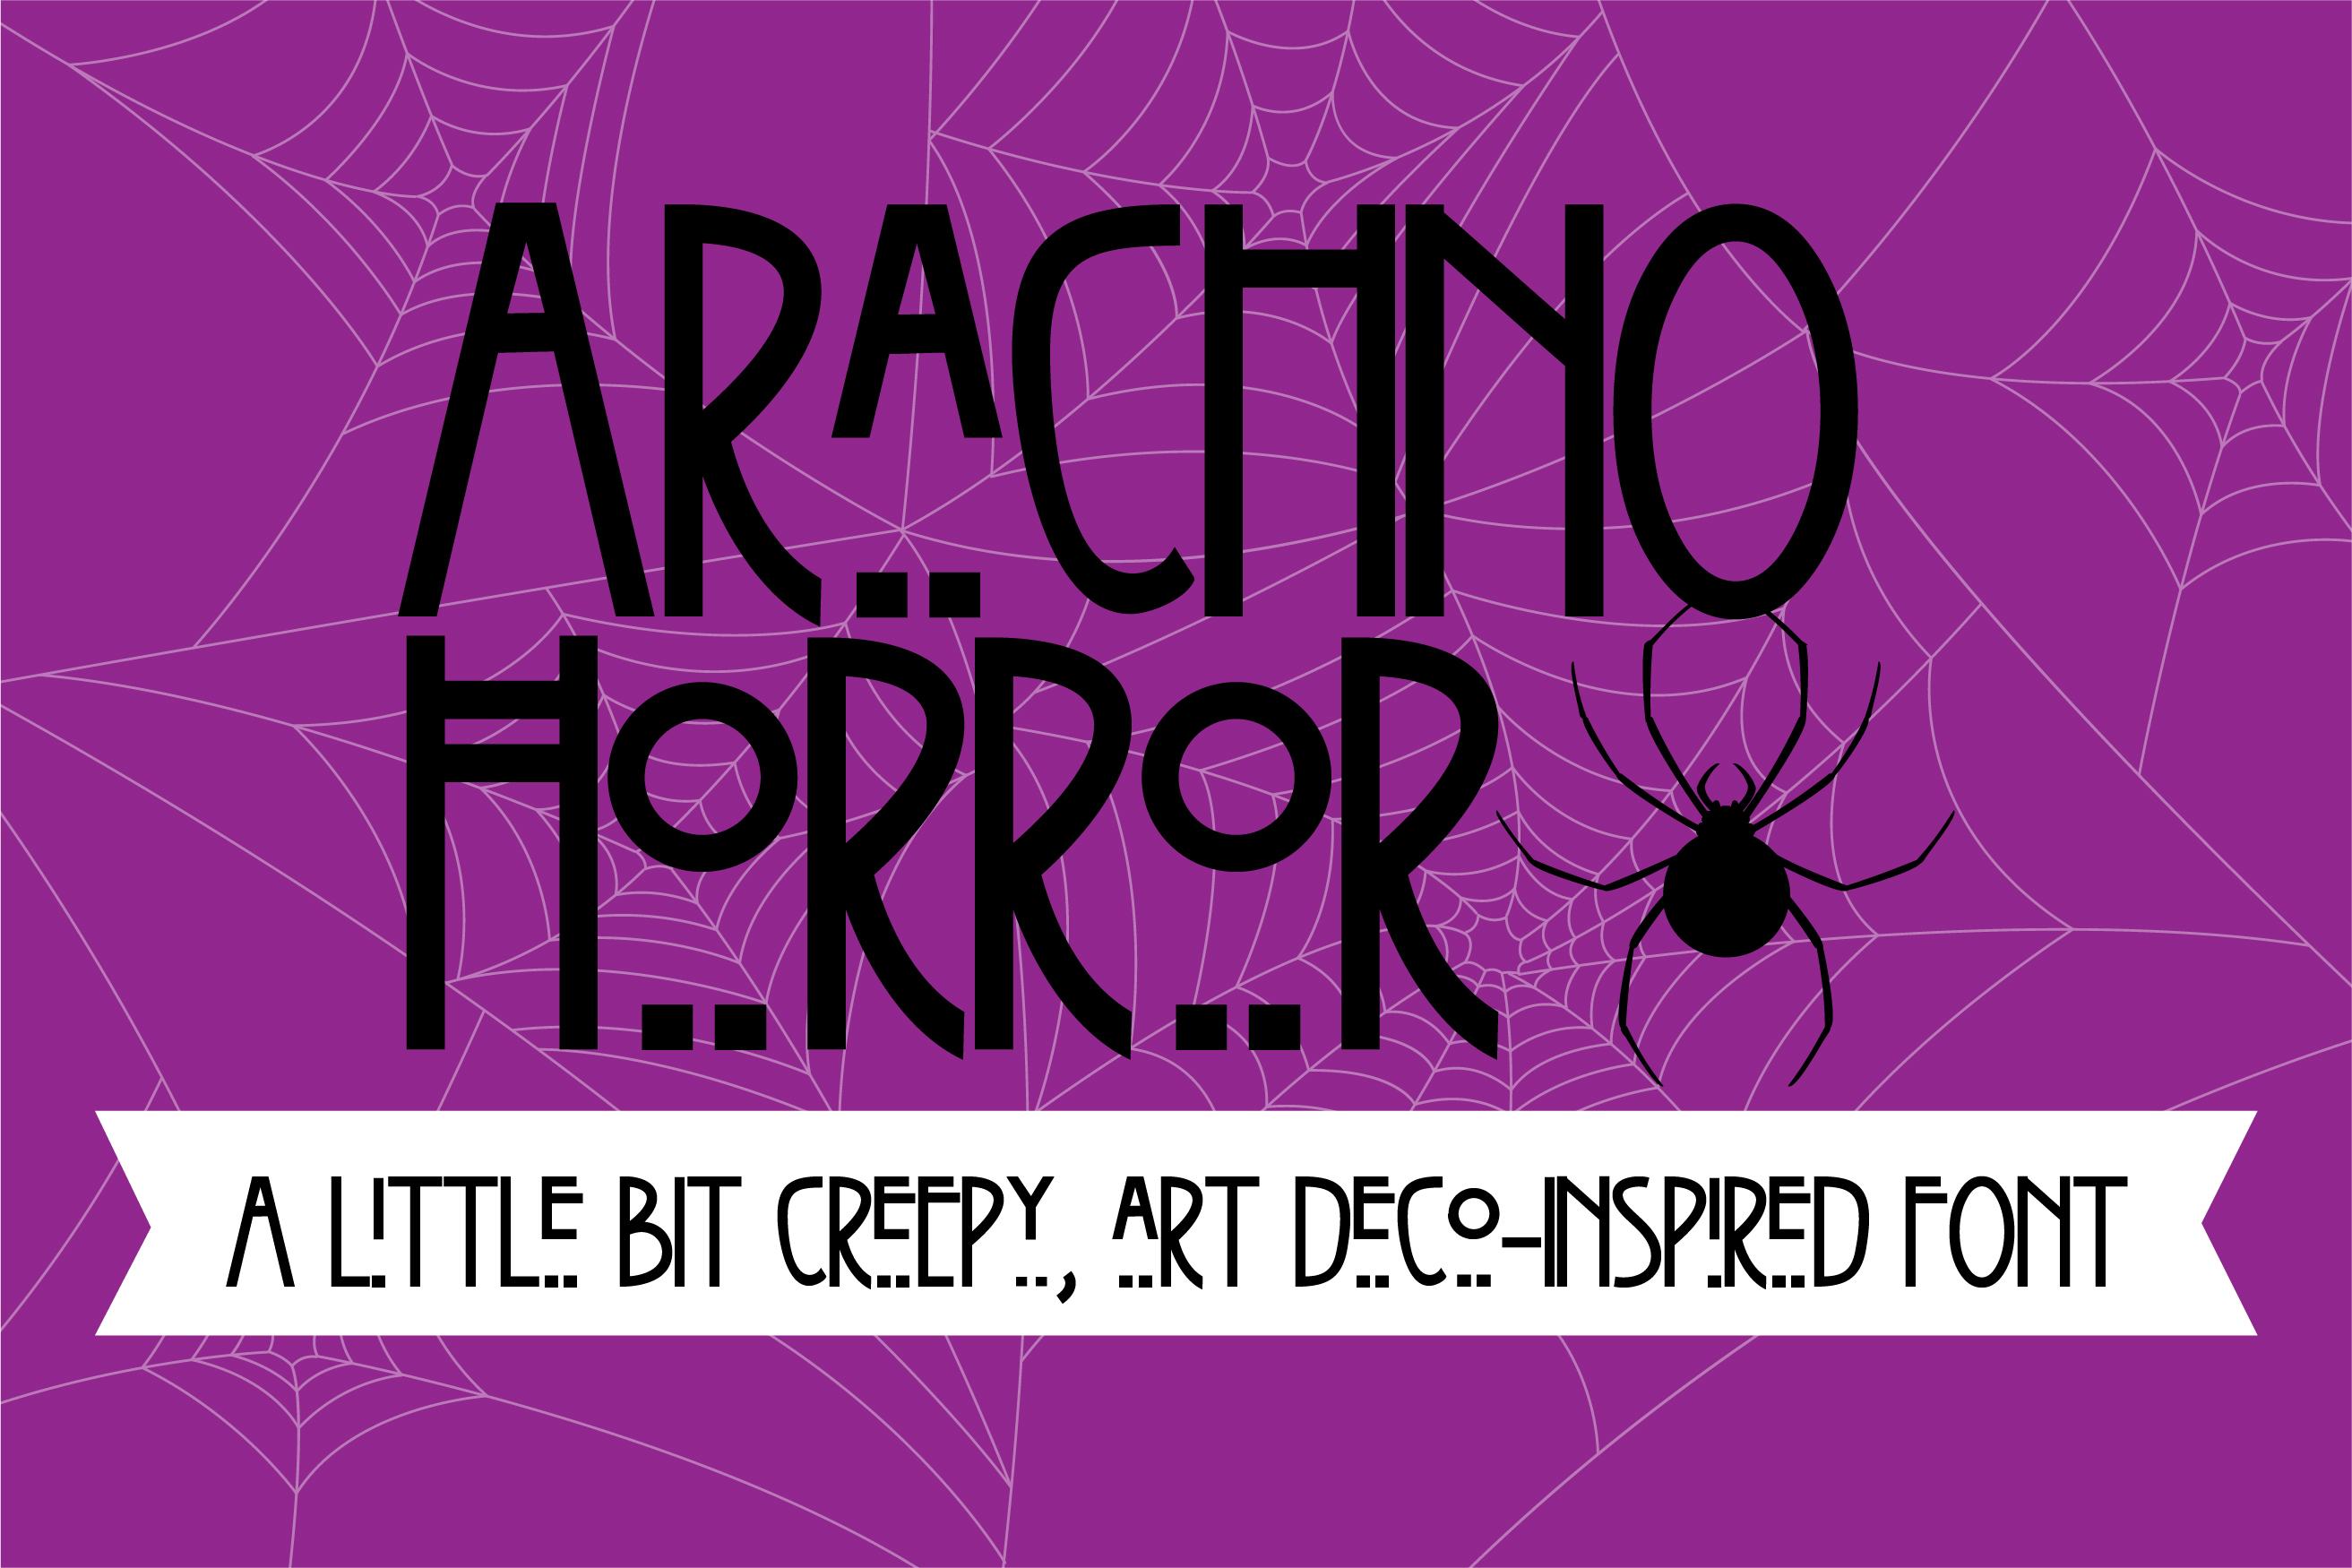 PN Arachno Horror example image 1